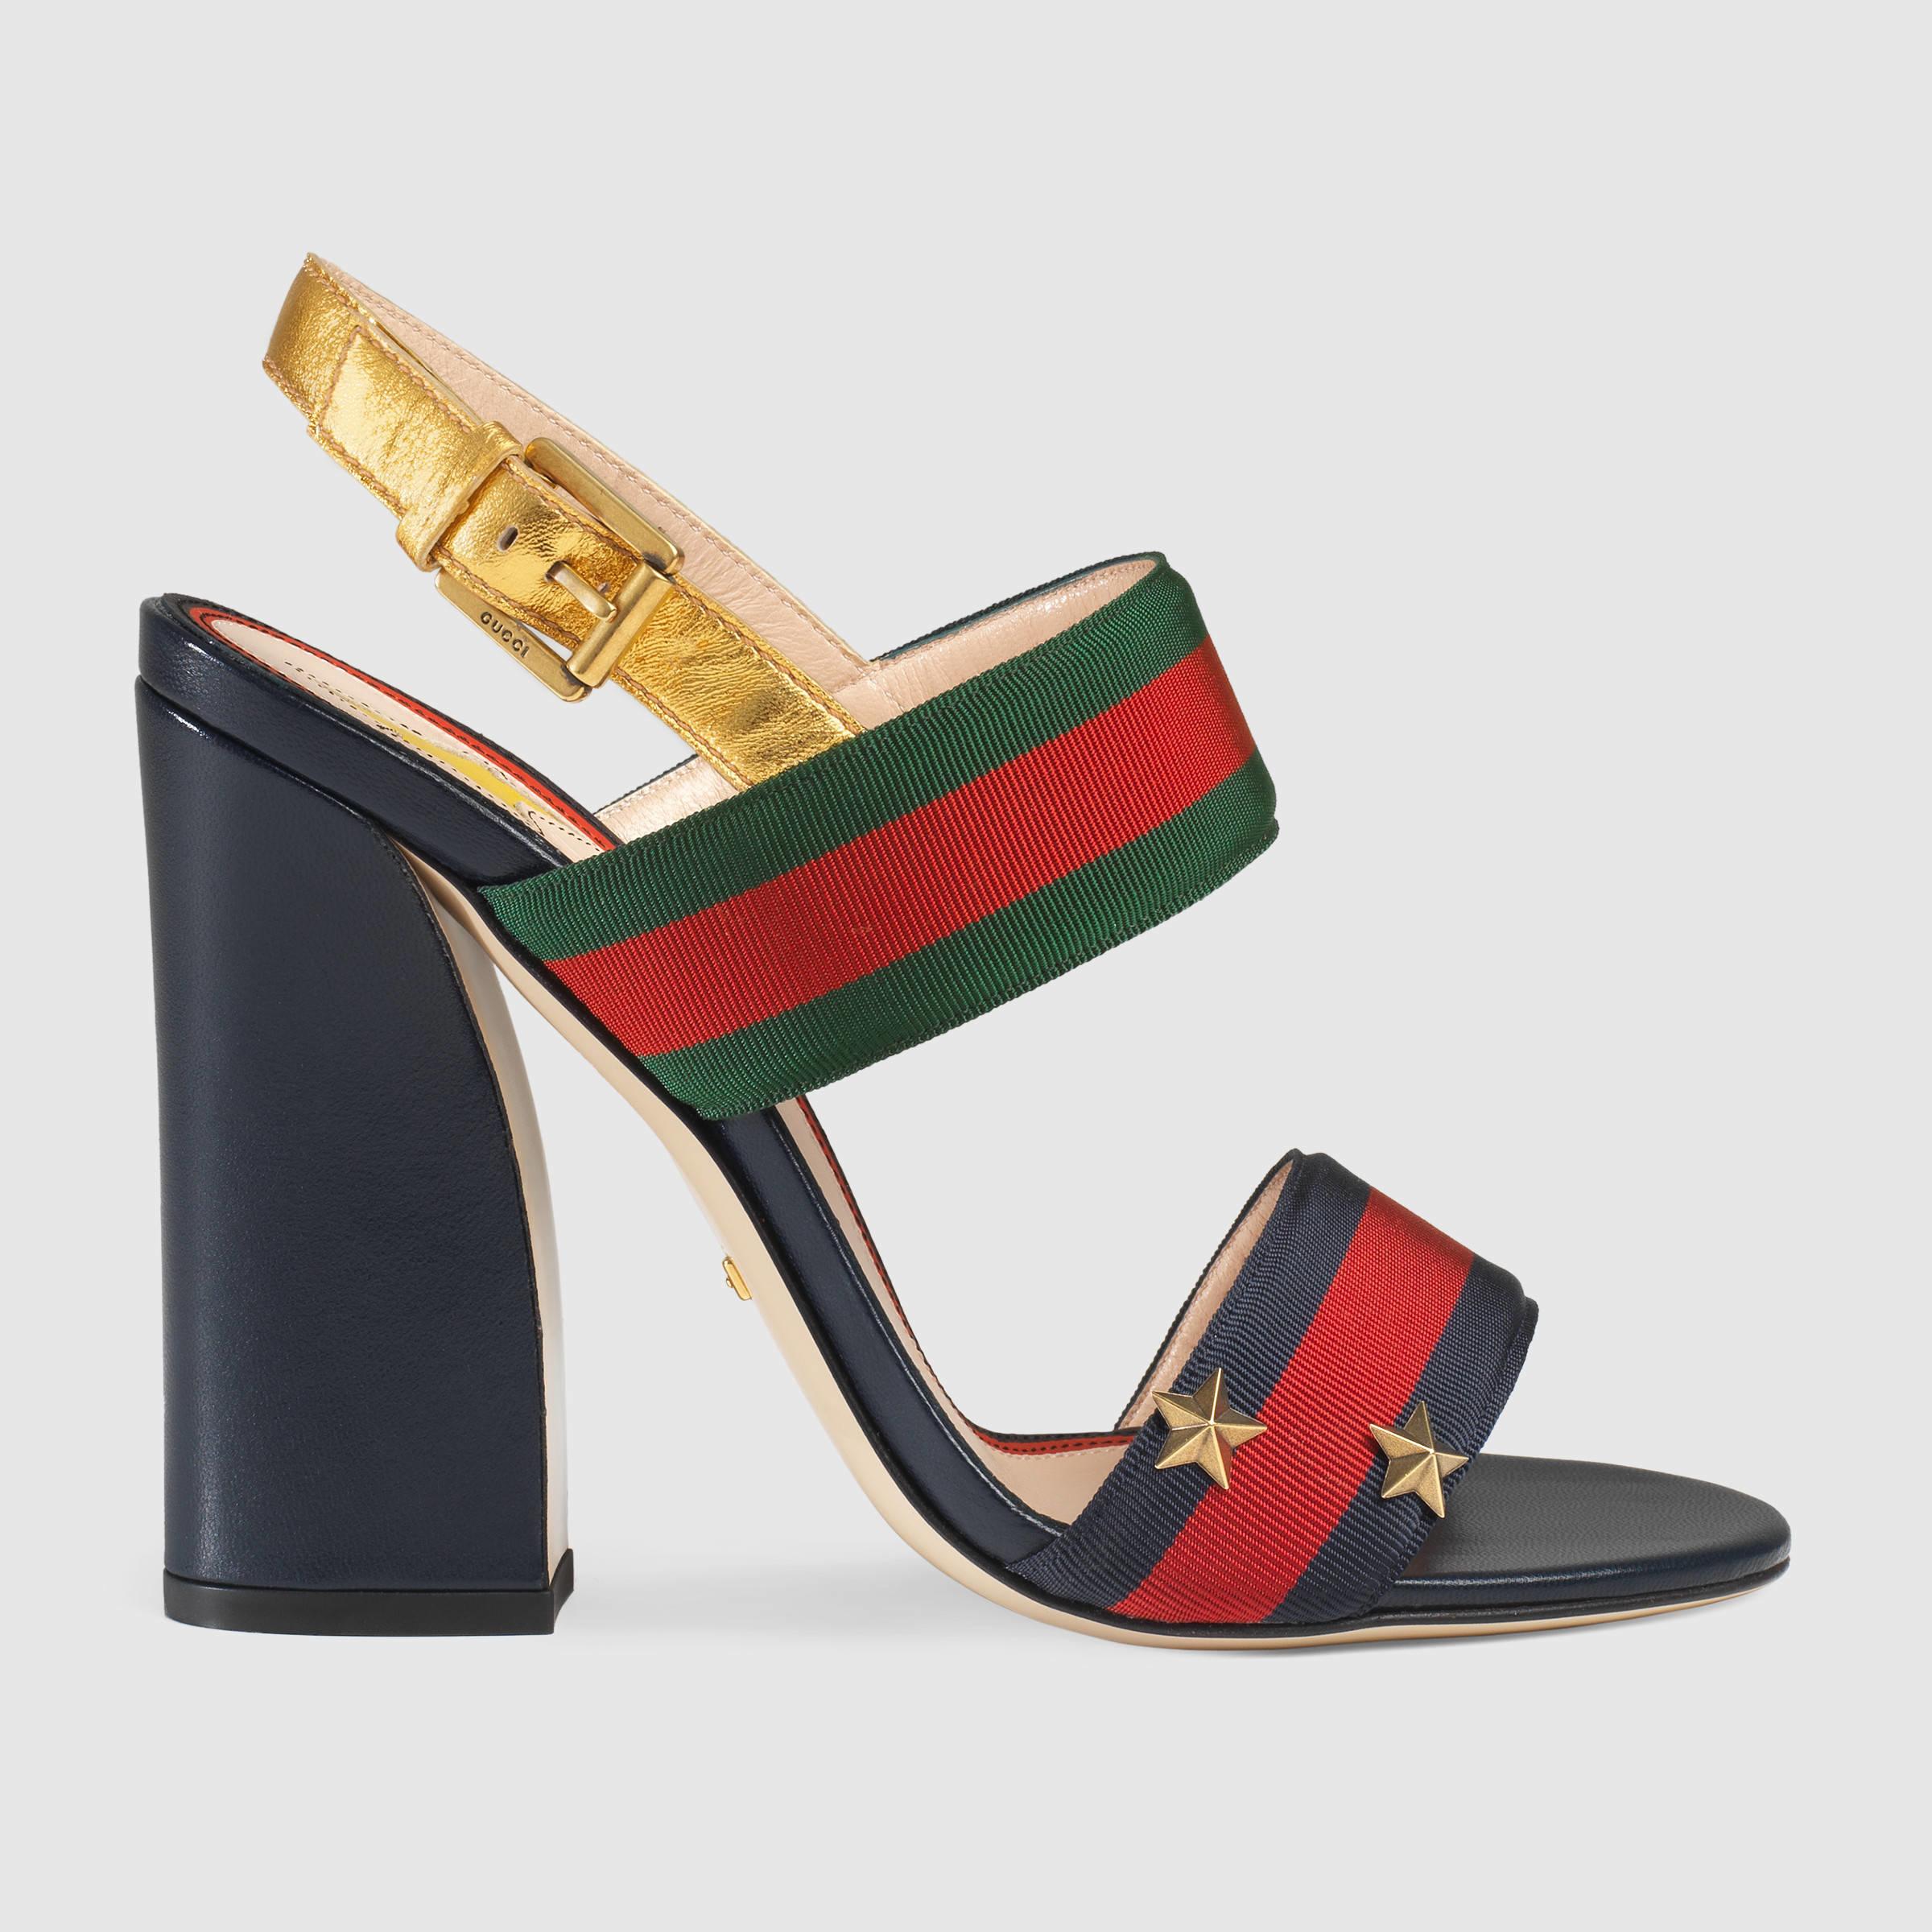 f40cbbba62c Lyst - Gucci Grosgrain Web Sandal in Red